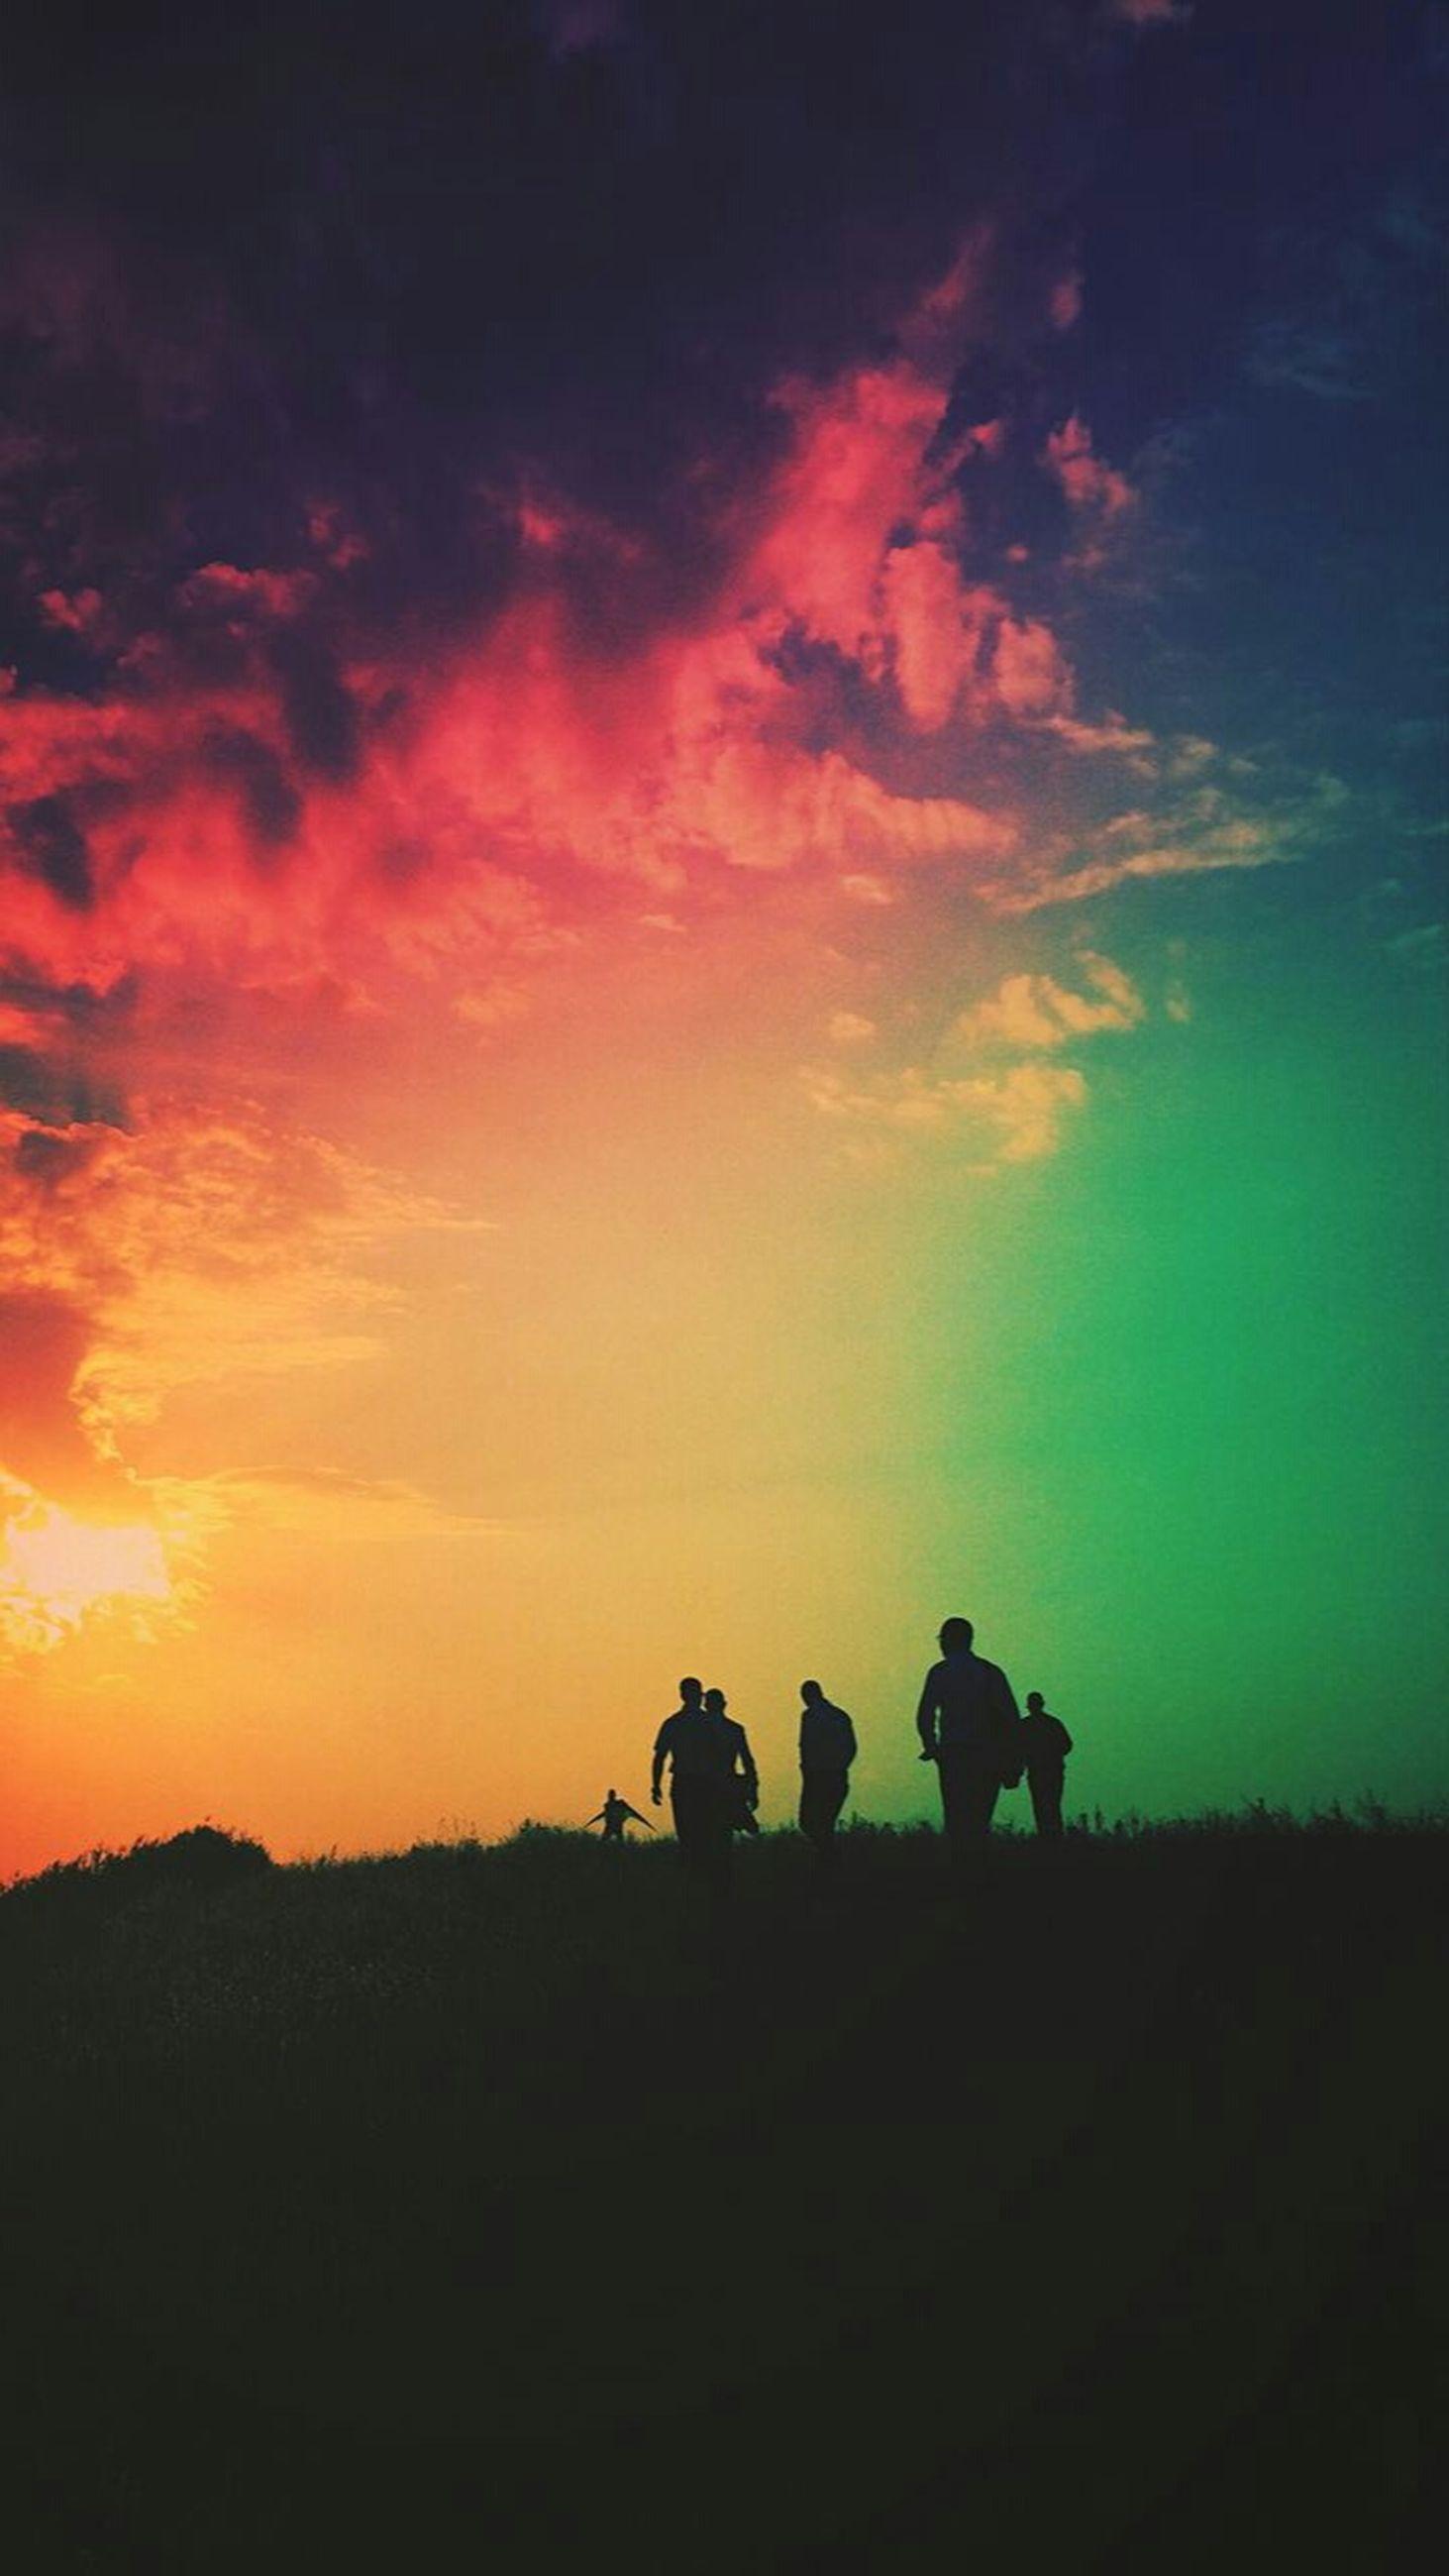 silhouette, sunset, sky, beauty in nature, scenics, tranquil scene, tranquility, landscape, cloud - sky, nature, orange color, men, idyllic, cloud, dusk, field, outline, outdoors, unrecognizable person